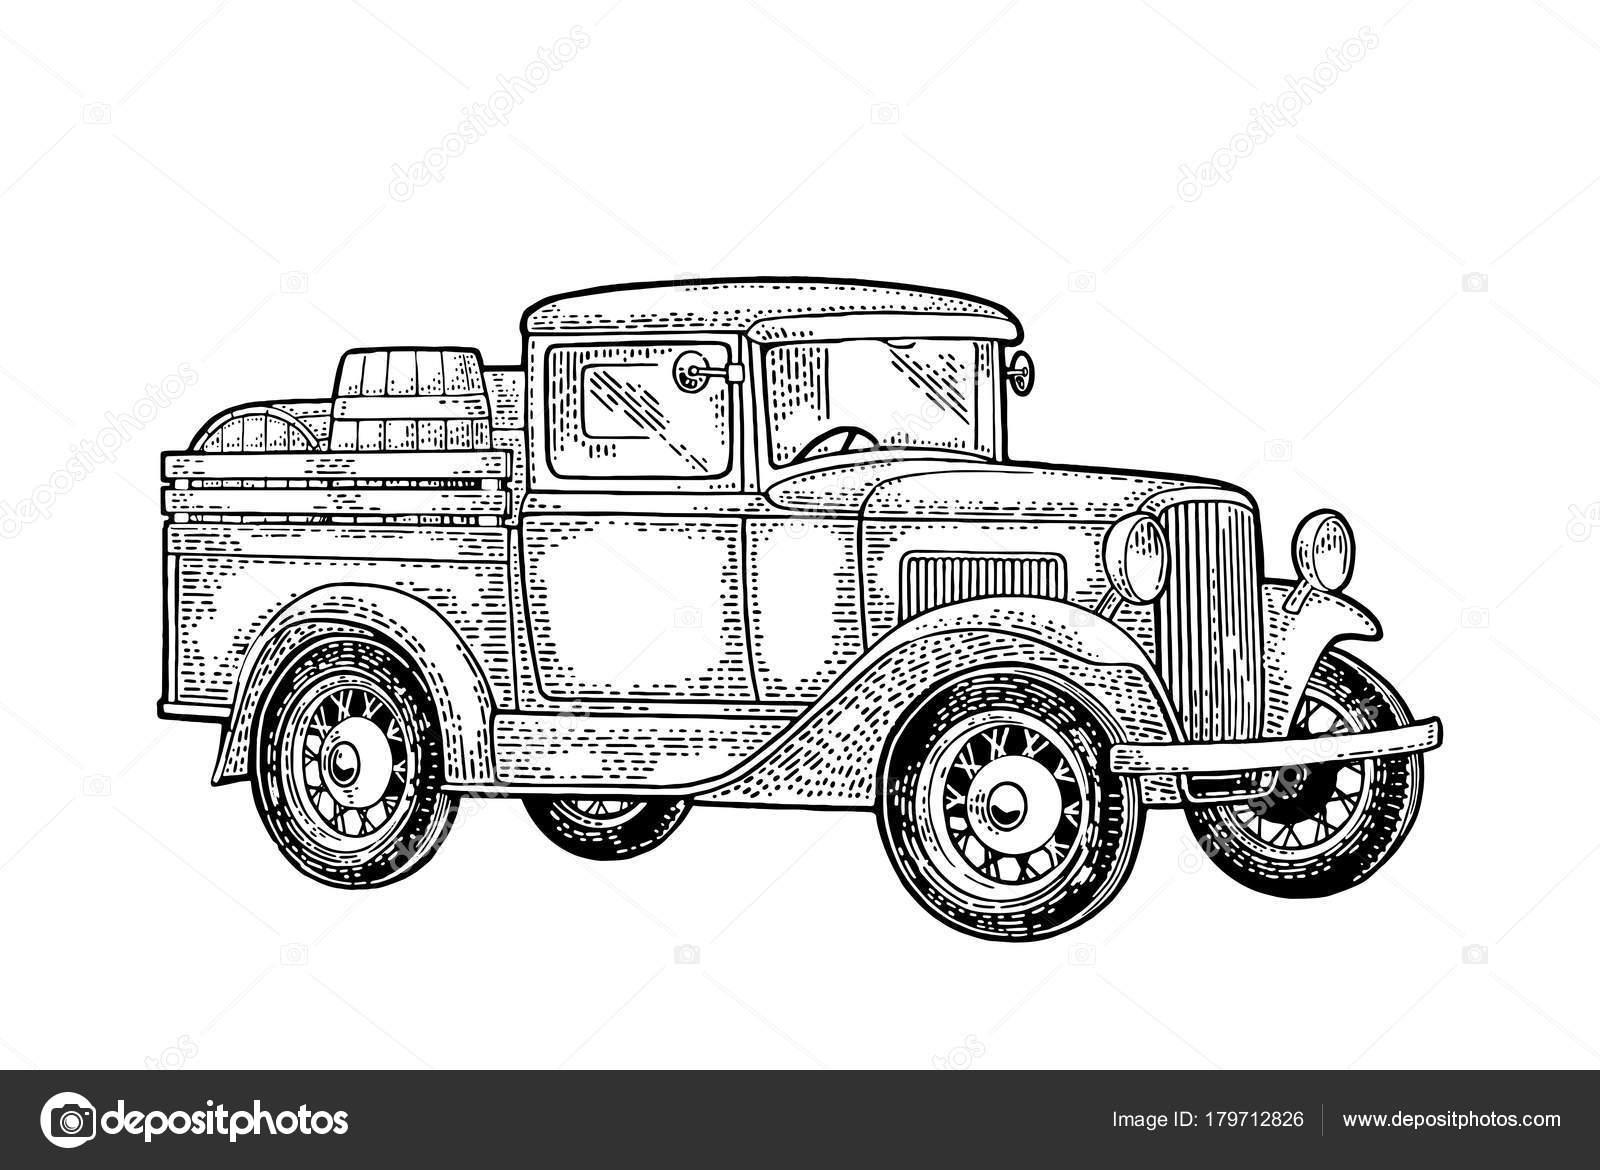 Retro Pickup Truck With Wood Barrel Side View Vintage Black Engraving Stock Vector C Denispotysiev 179712826